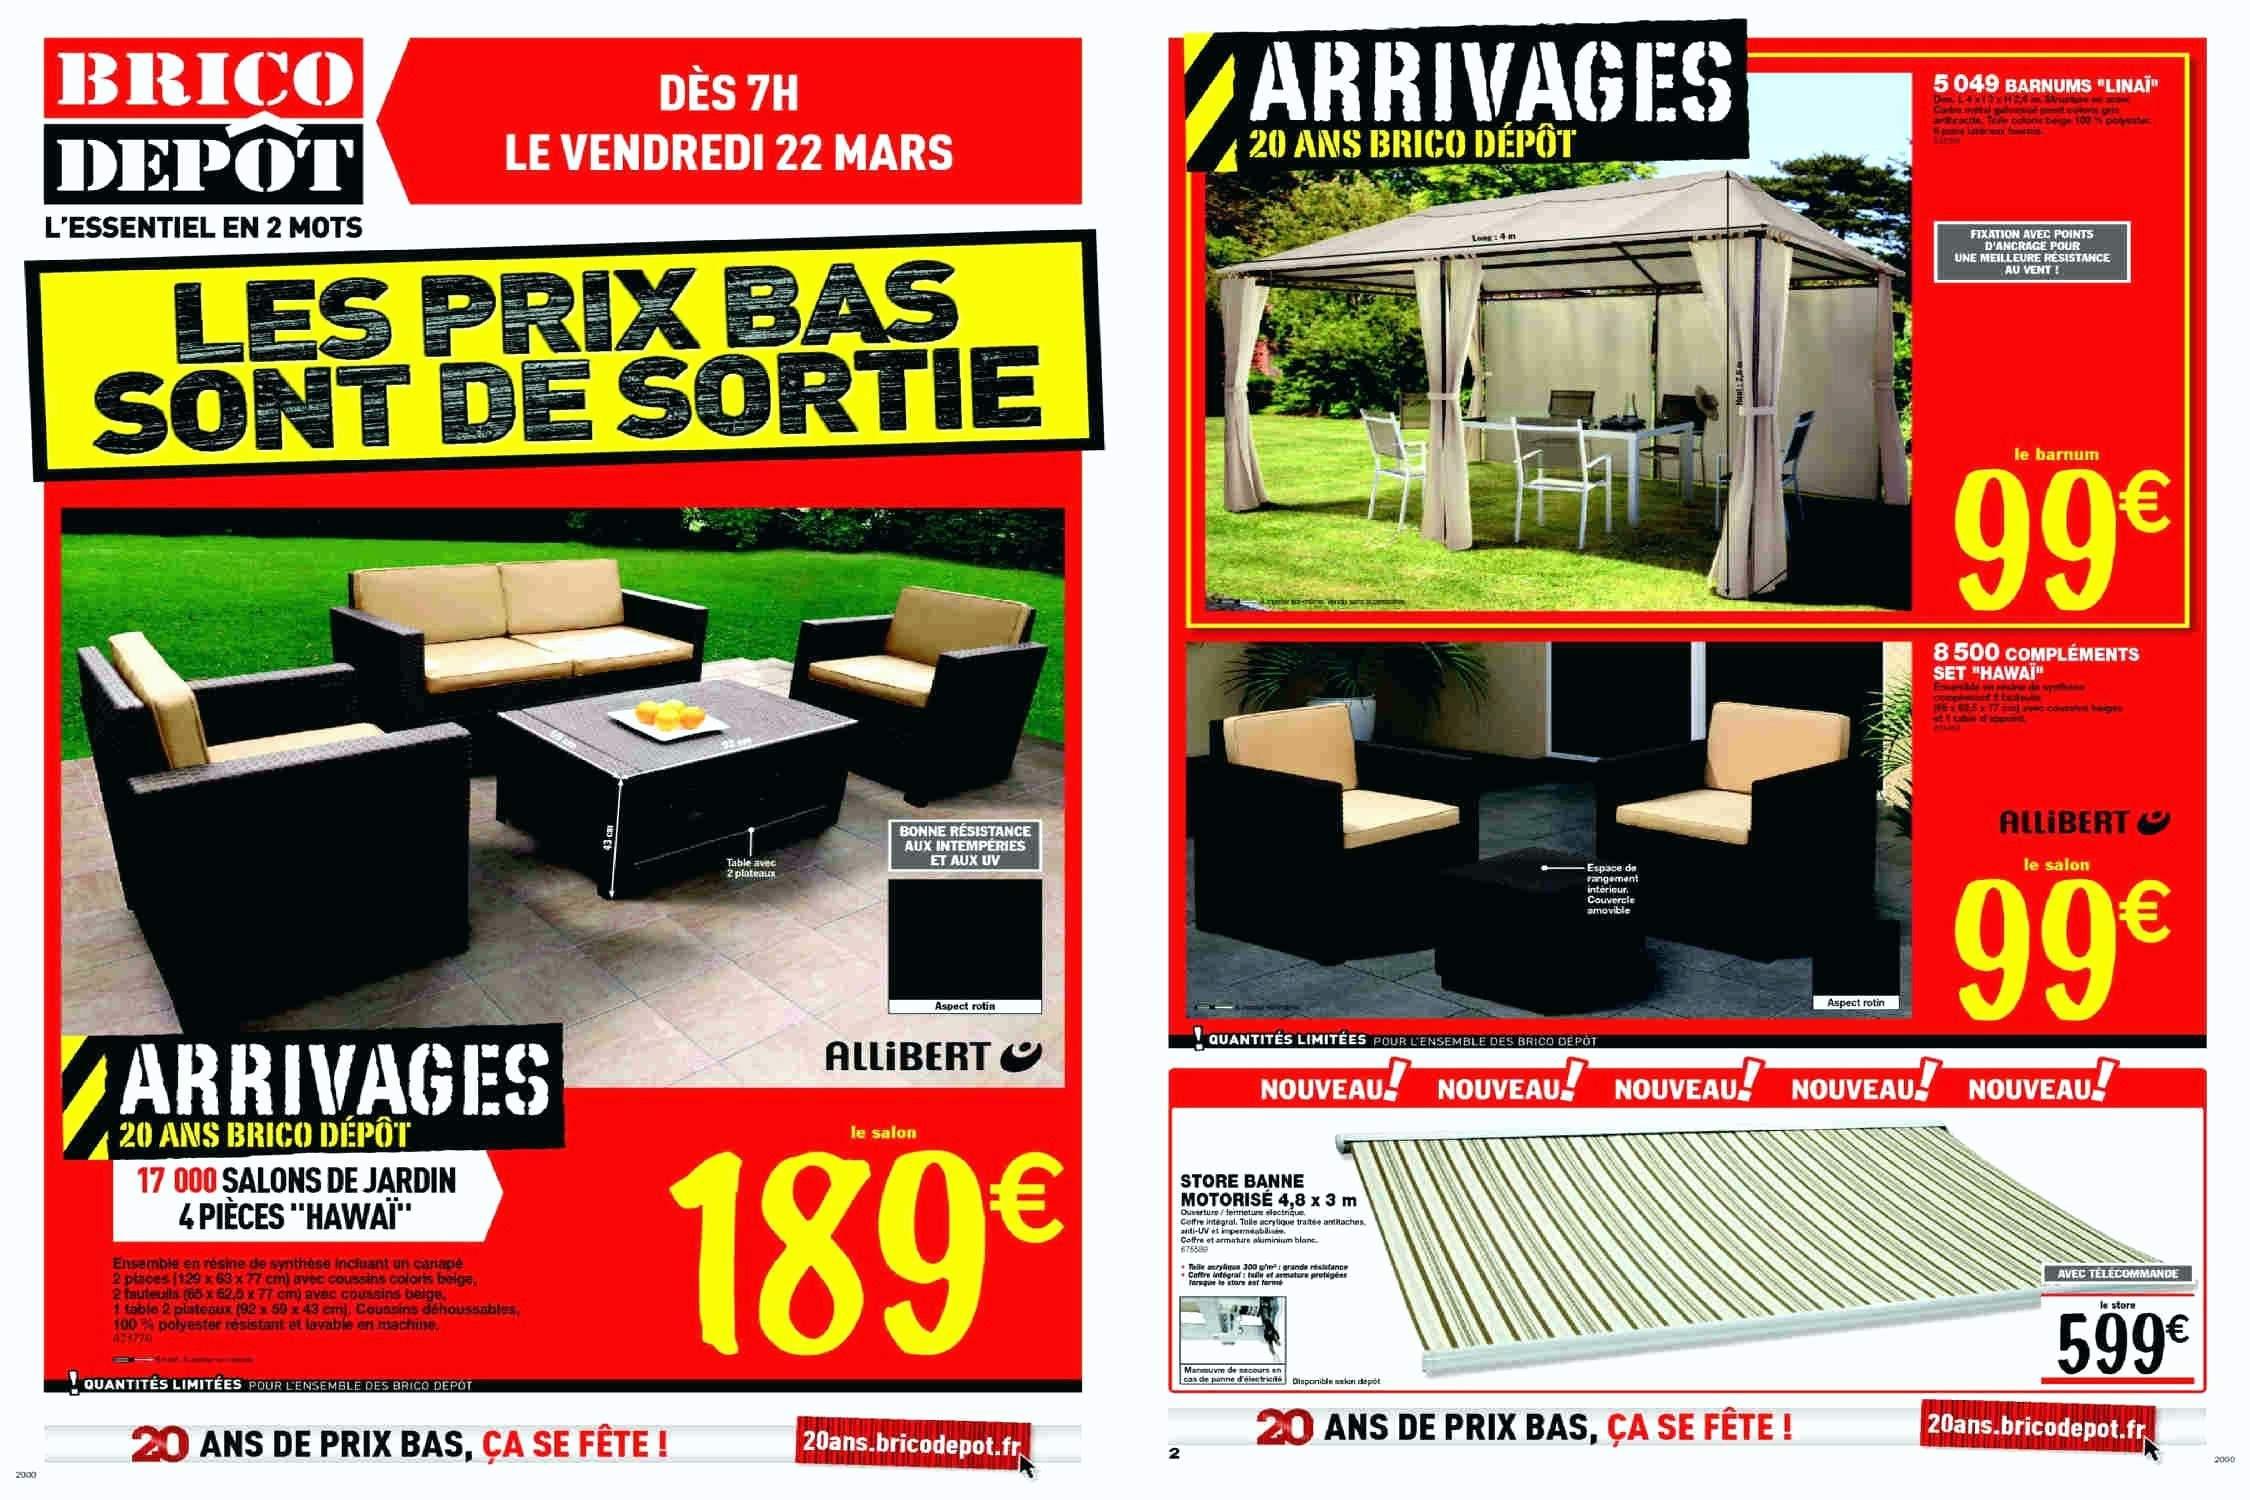 Abris De Jardin Metal Brico Depot Frais Images Table De Jardin Brico Depot Meilleur De Abris De Jardin Metal Brico